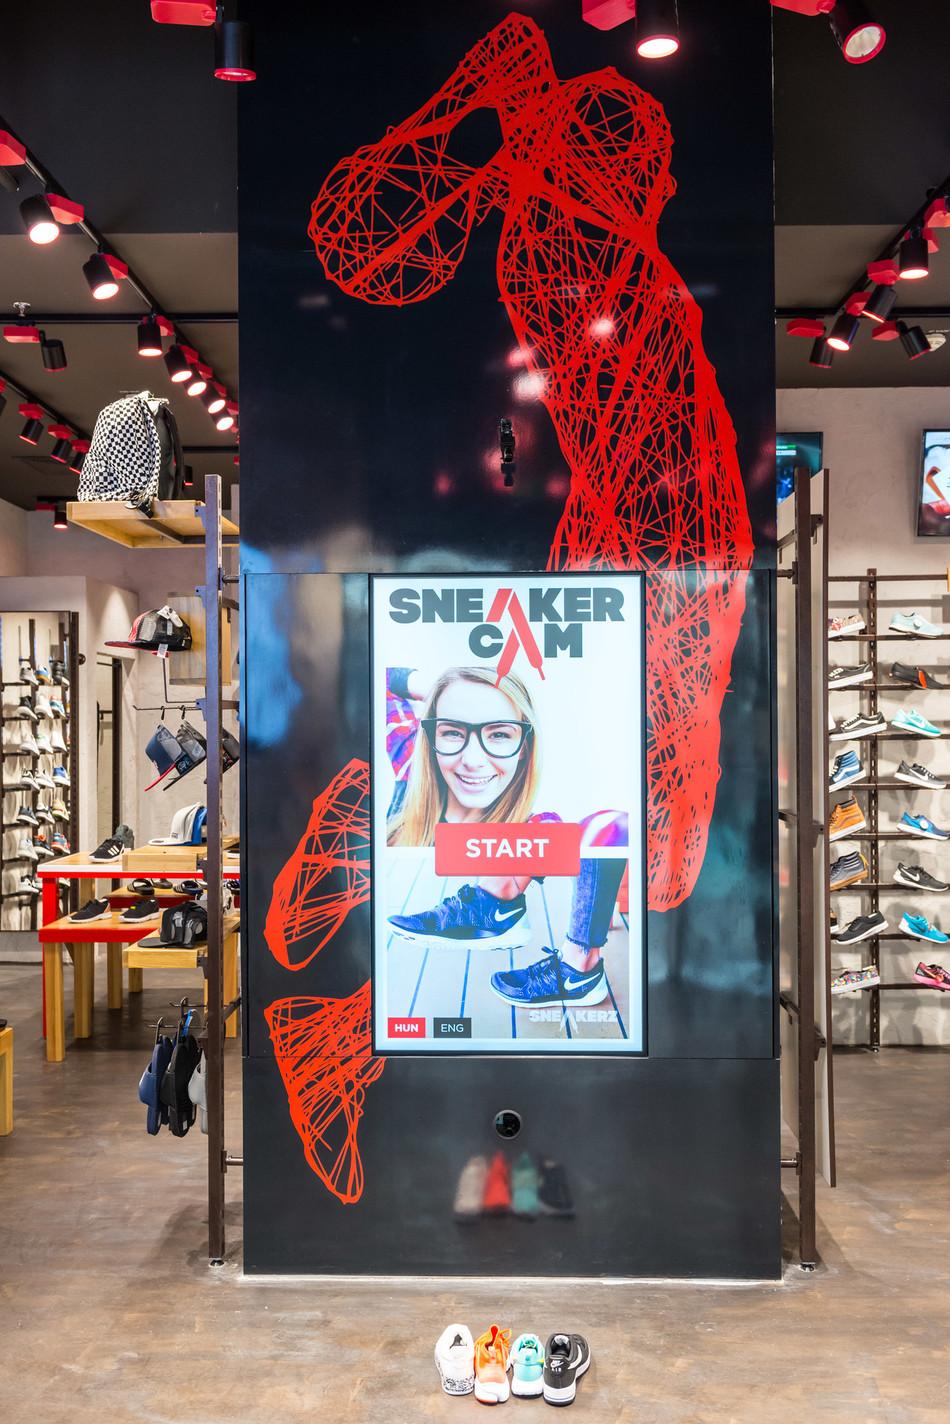 Sneaker Cam